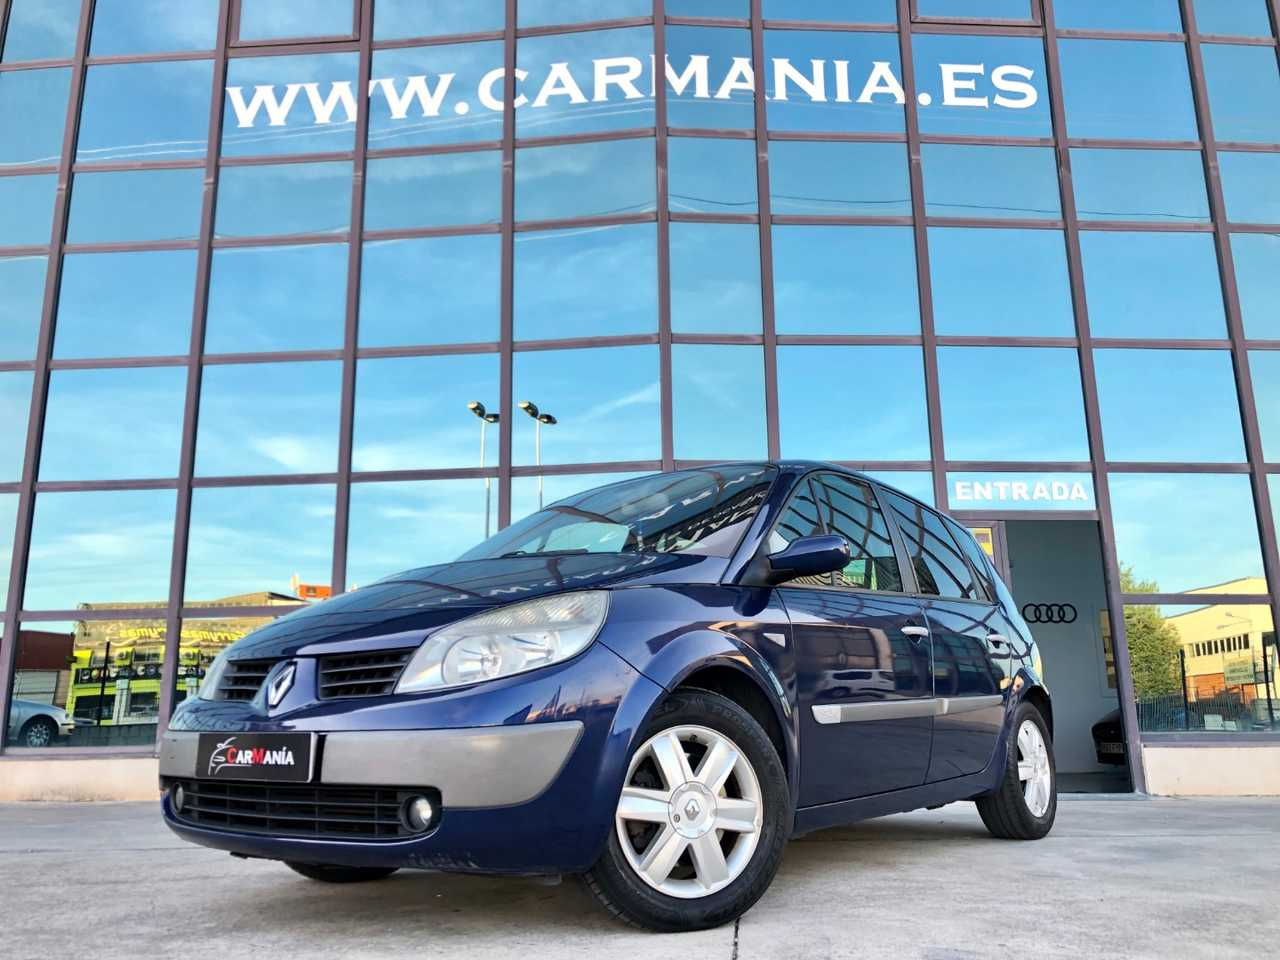 Renault Scénic 1.9 cdi 120CV   - Foto 1